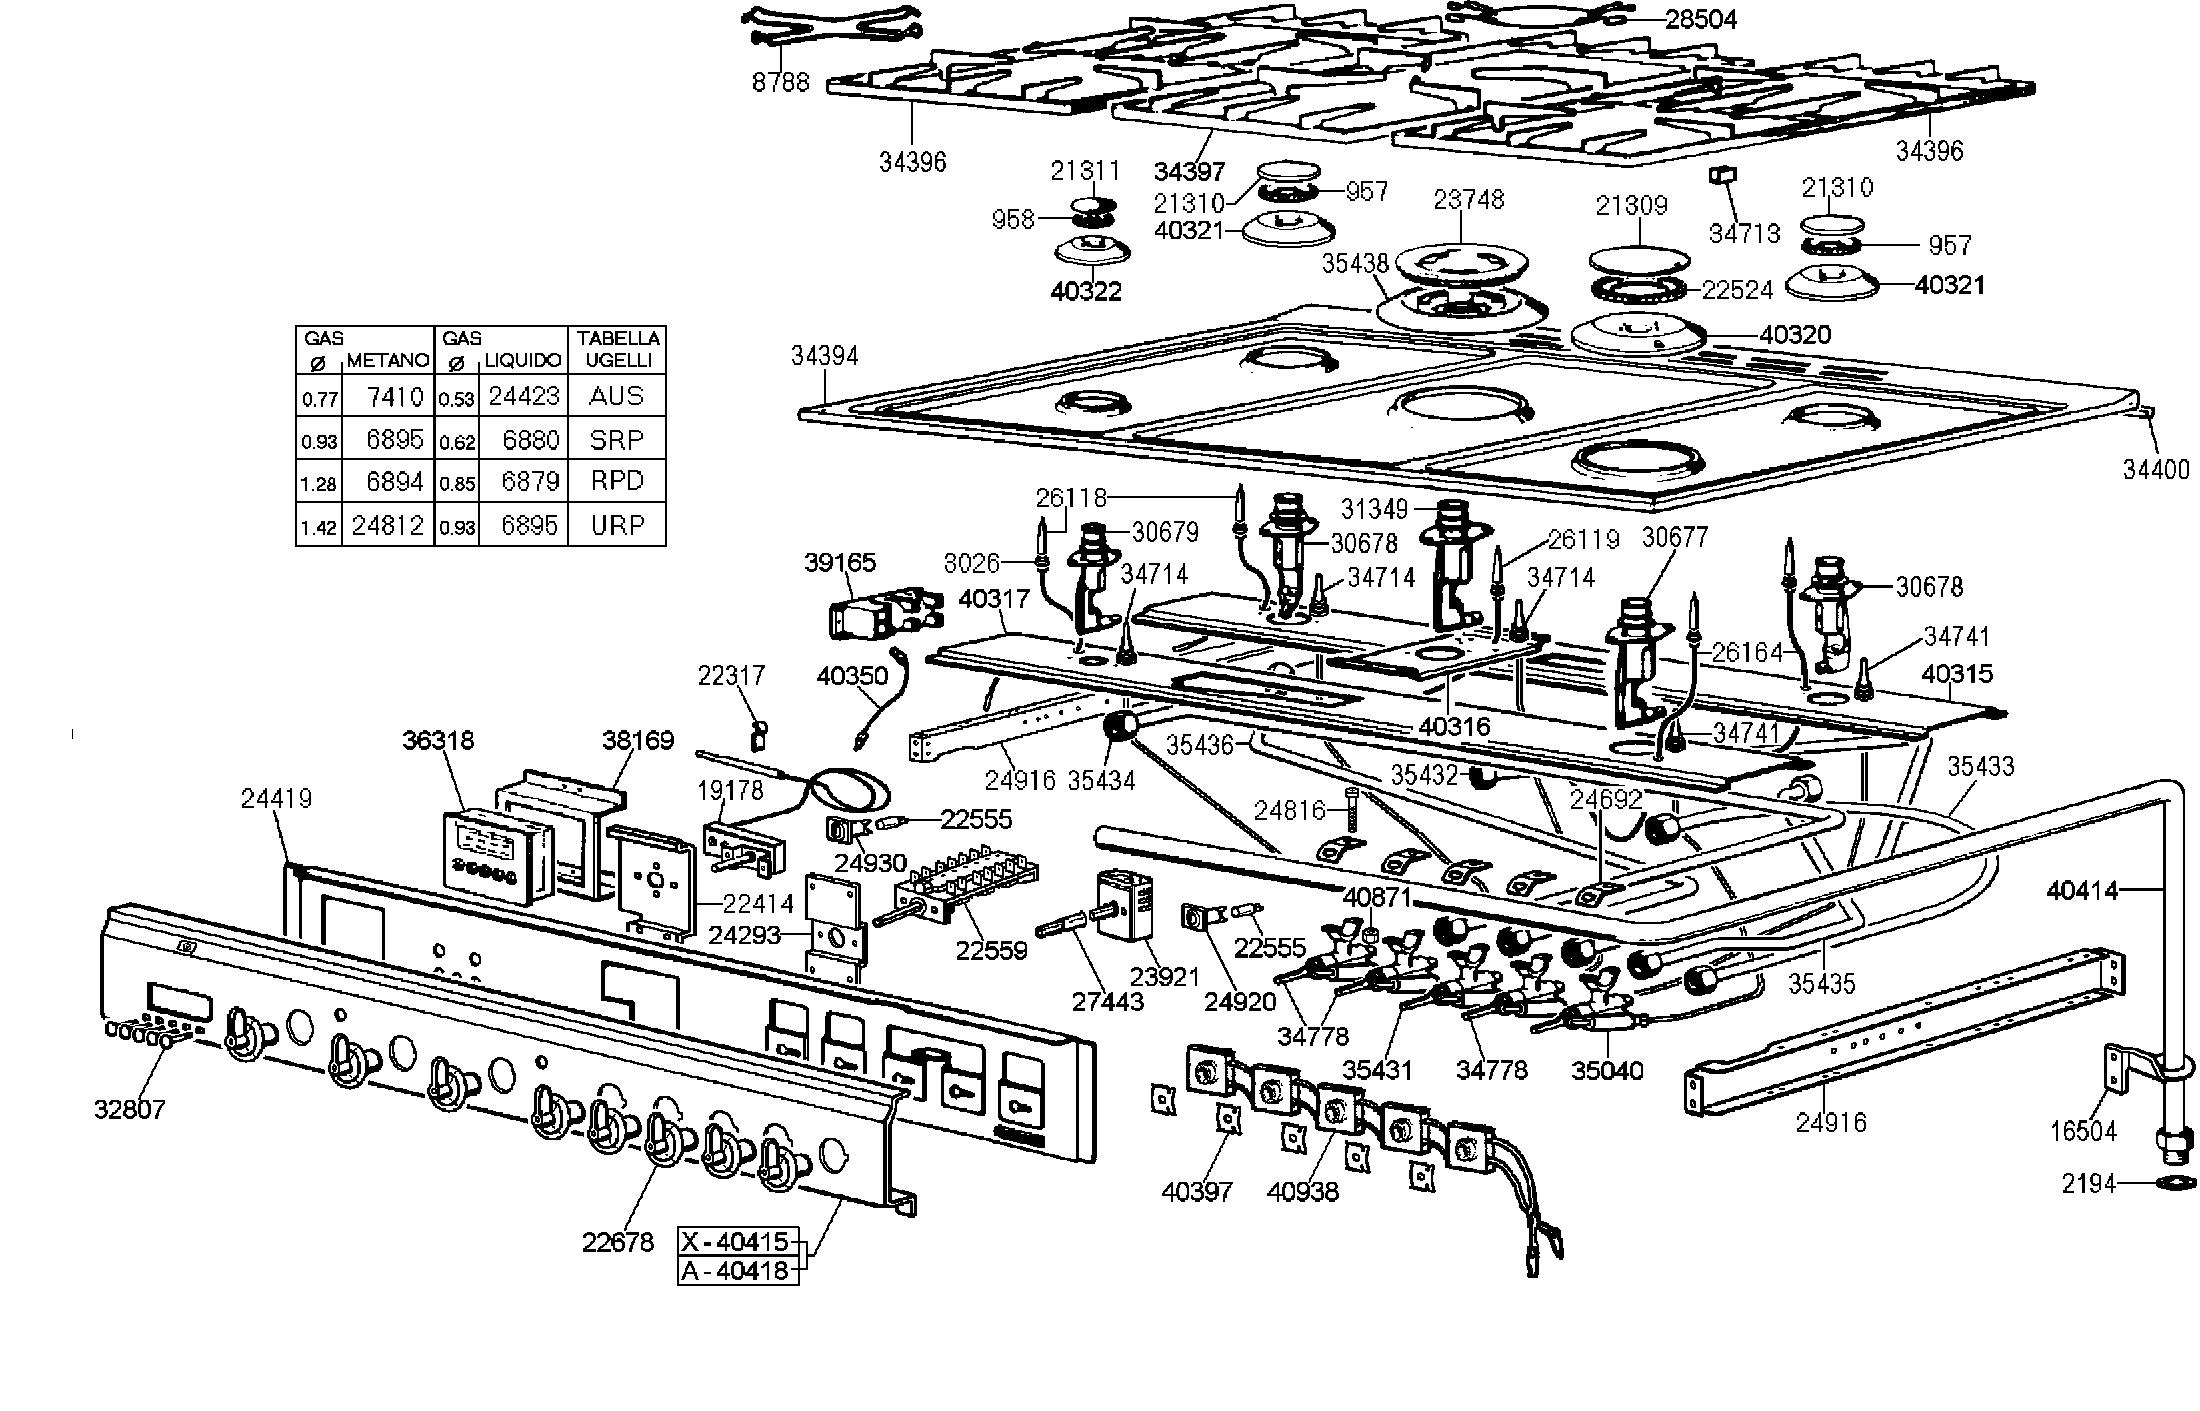 smeg induction hob wiring diagram d link rj45 keystone jack range library